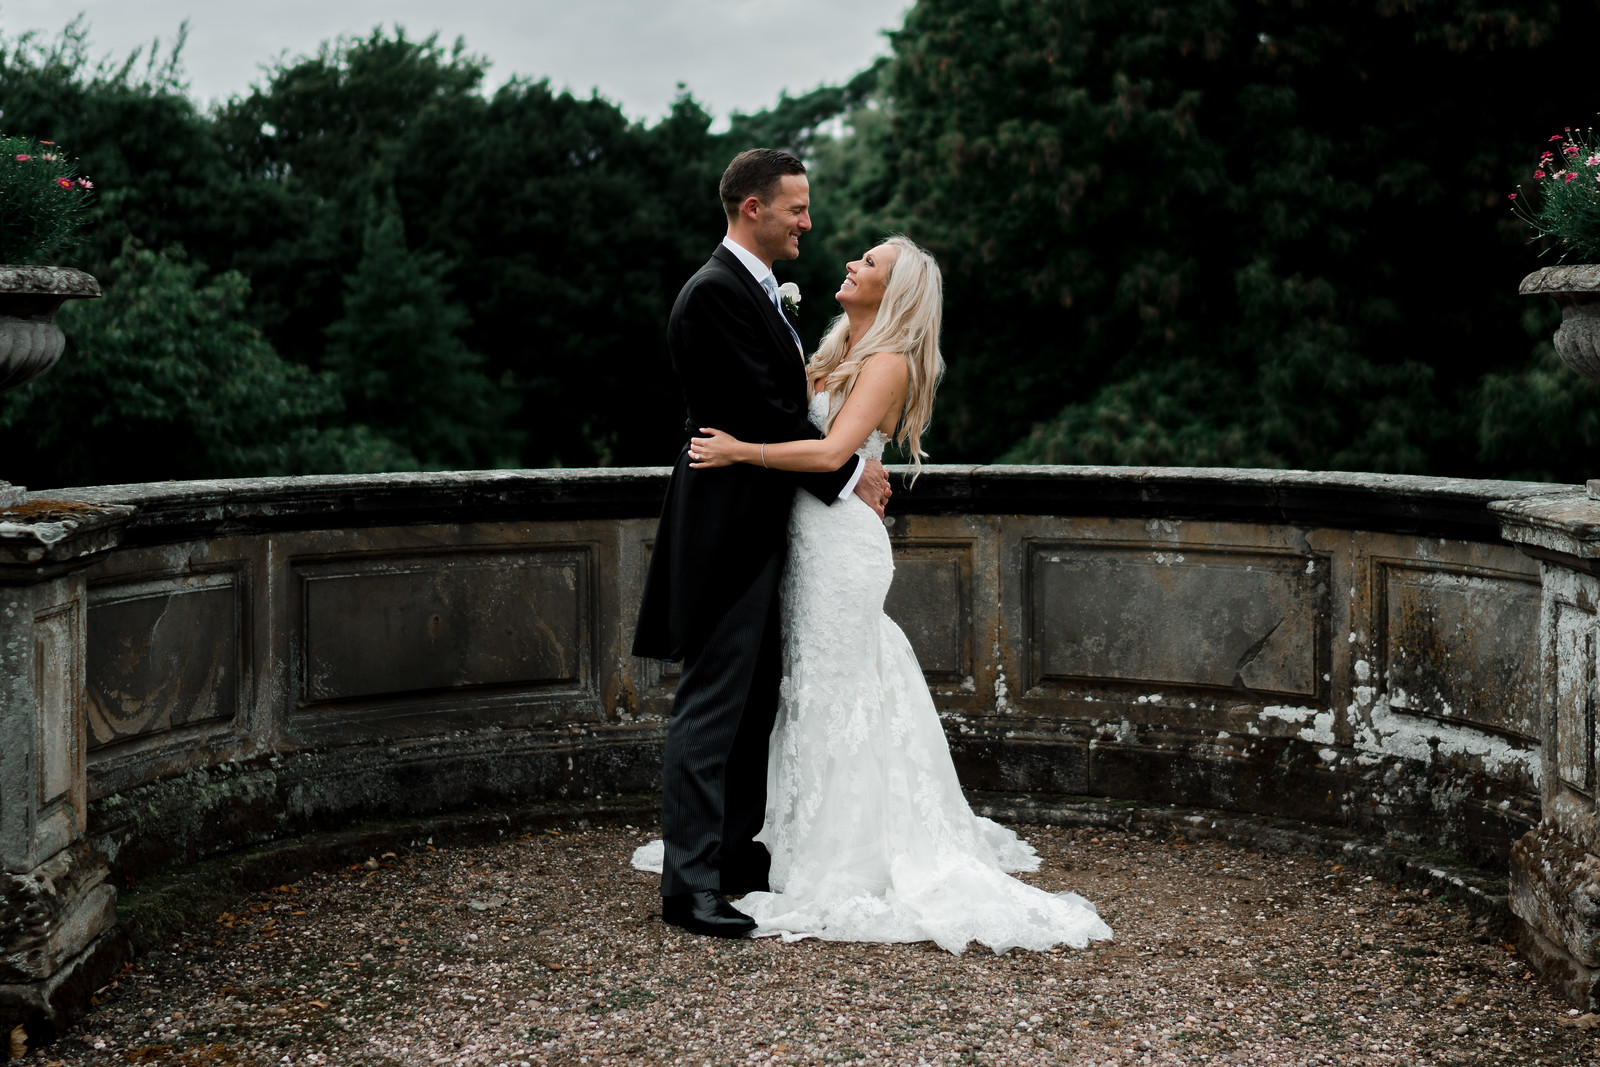 Bride and groom look at each other in their elegant wedding venue